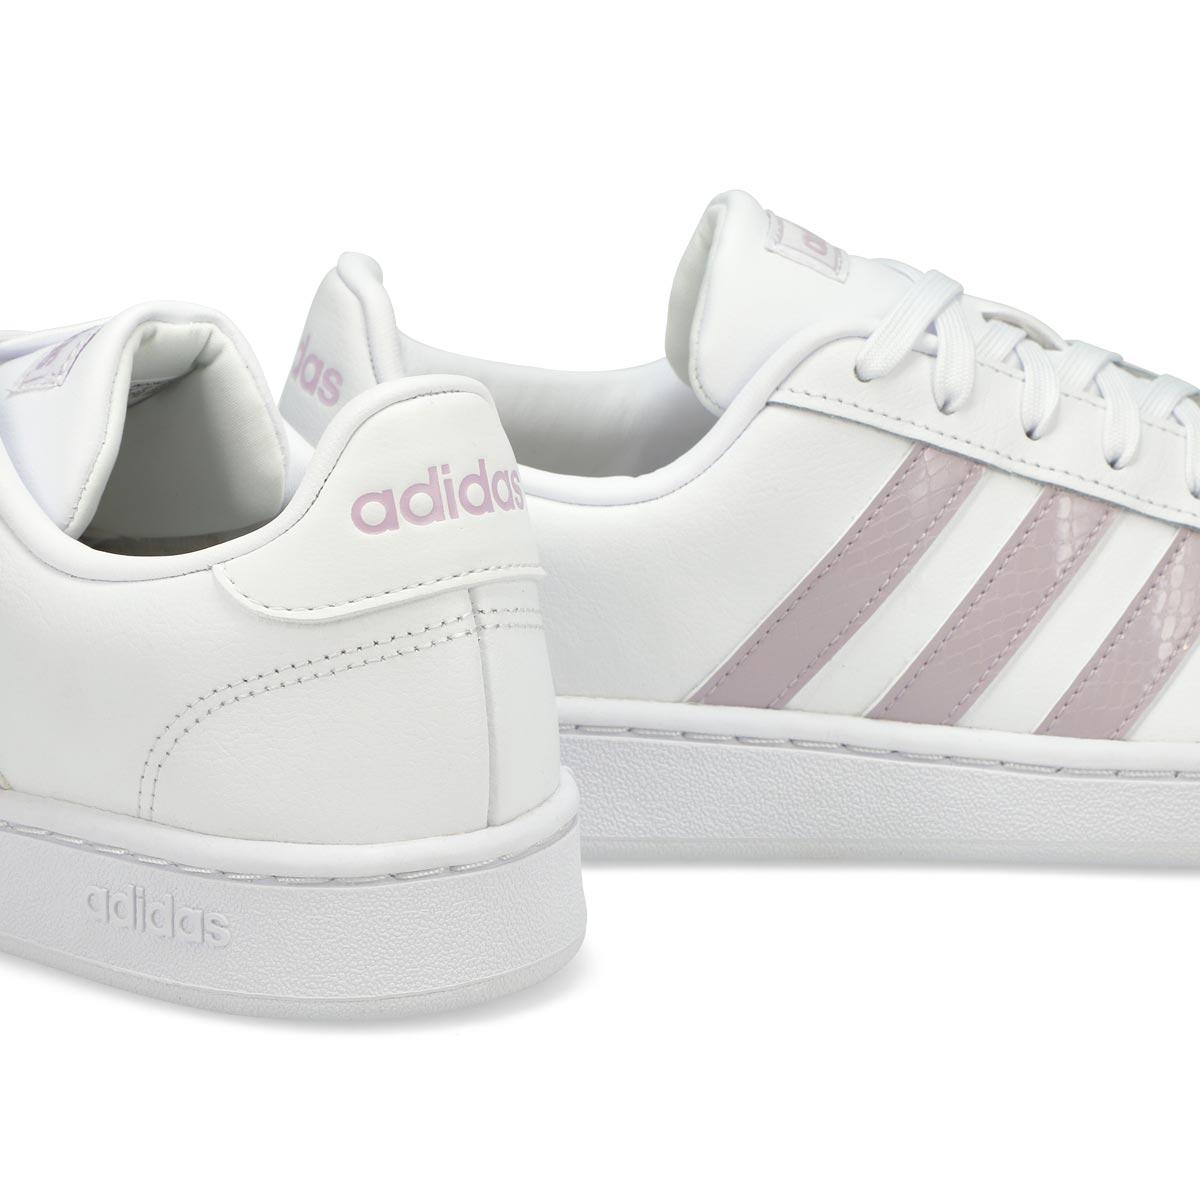 Women's Grand Court Sneaker - White/Mauve